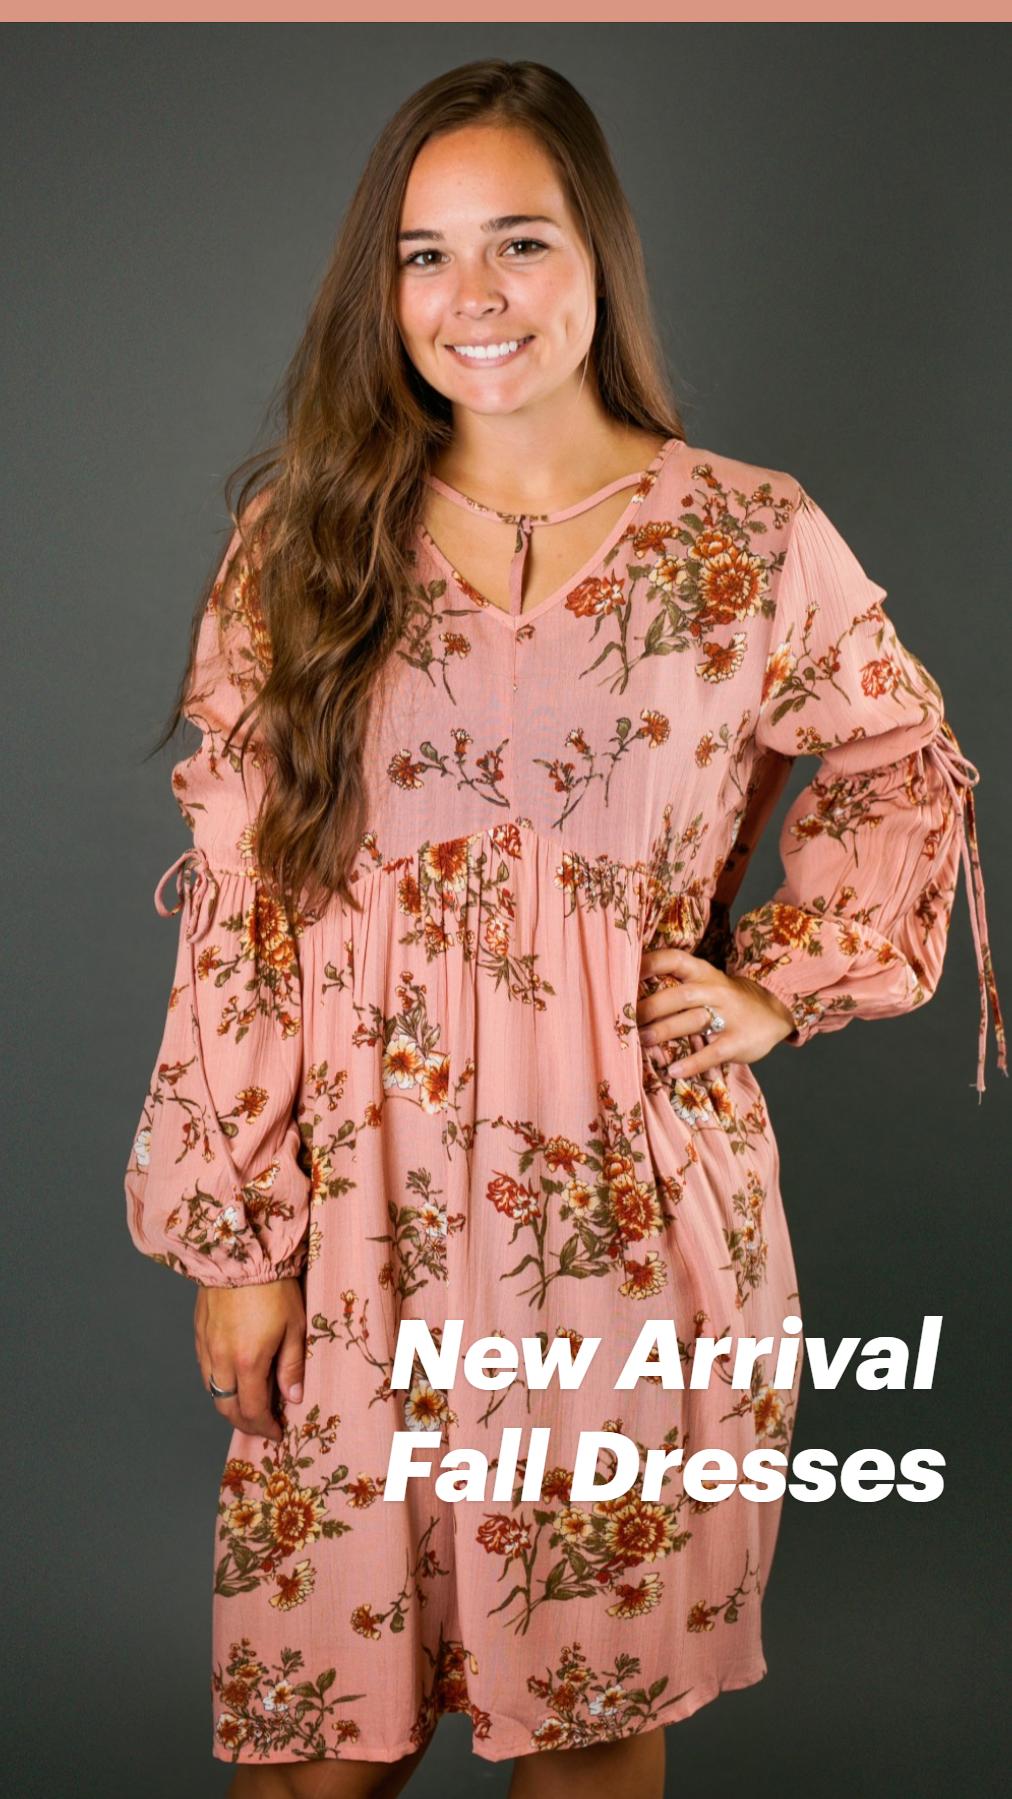 New Arrival Fall Dresses